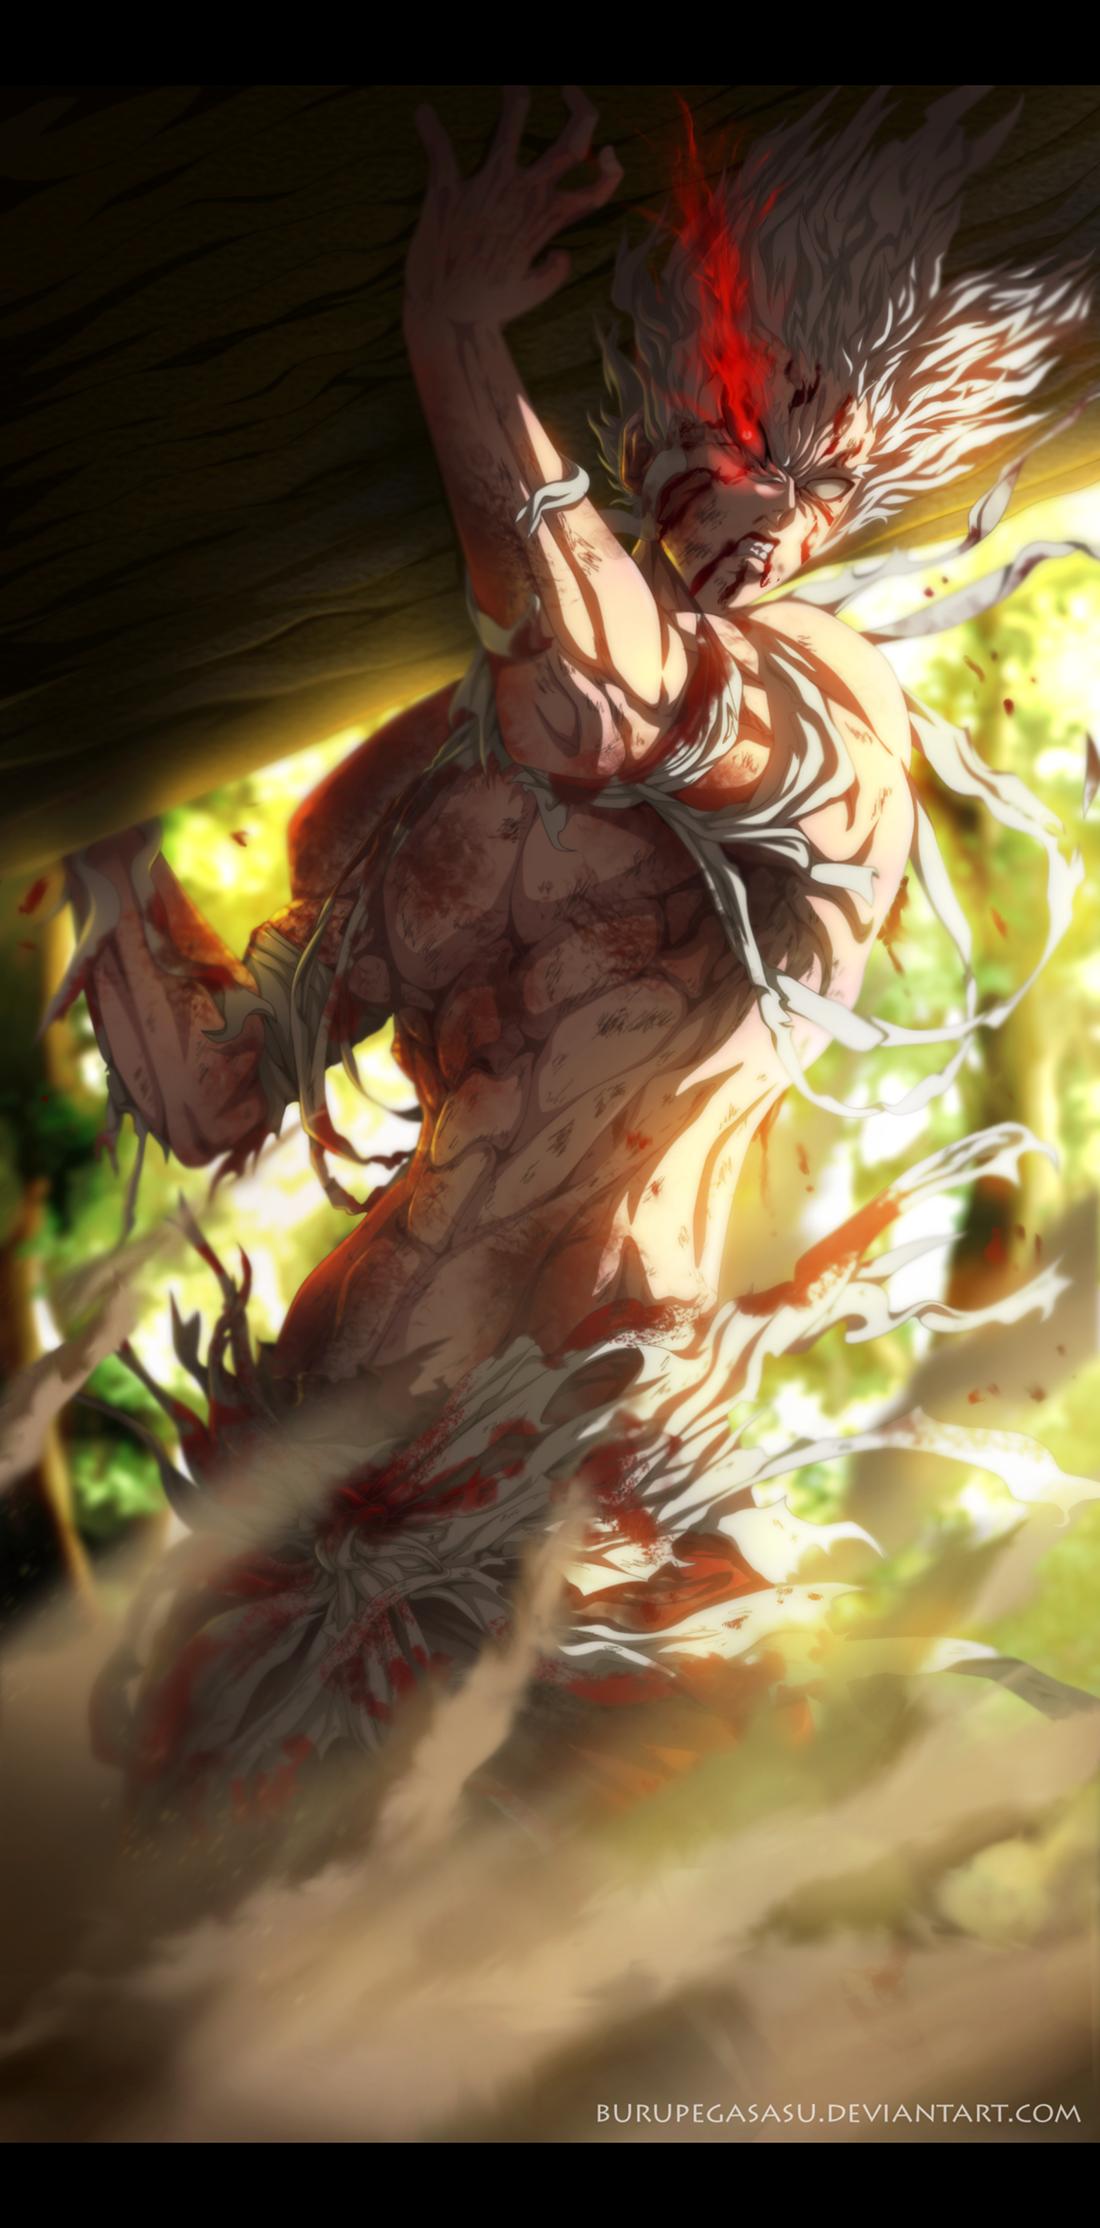 Garou One Punch Man Wallpaper 42934909 Fanpop Page 3